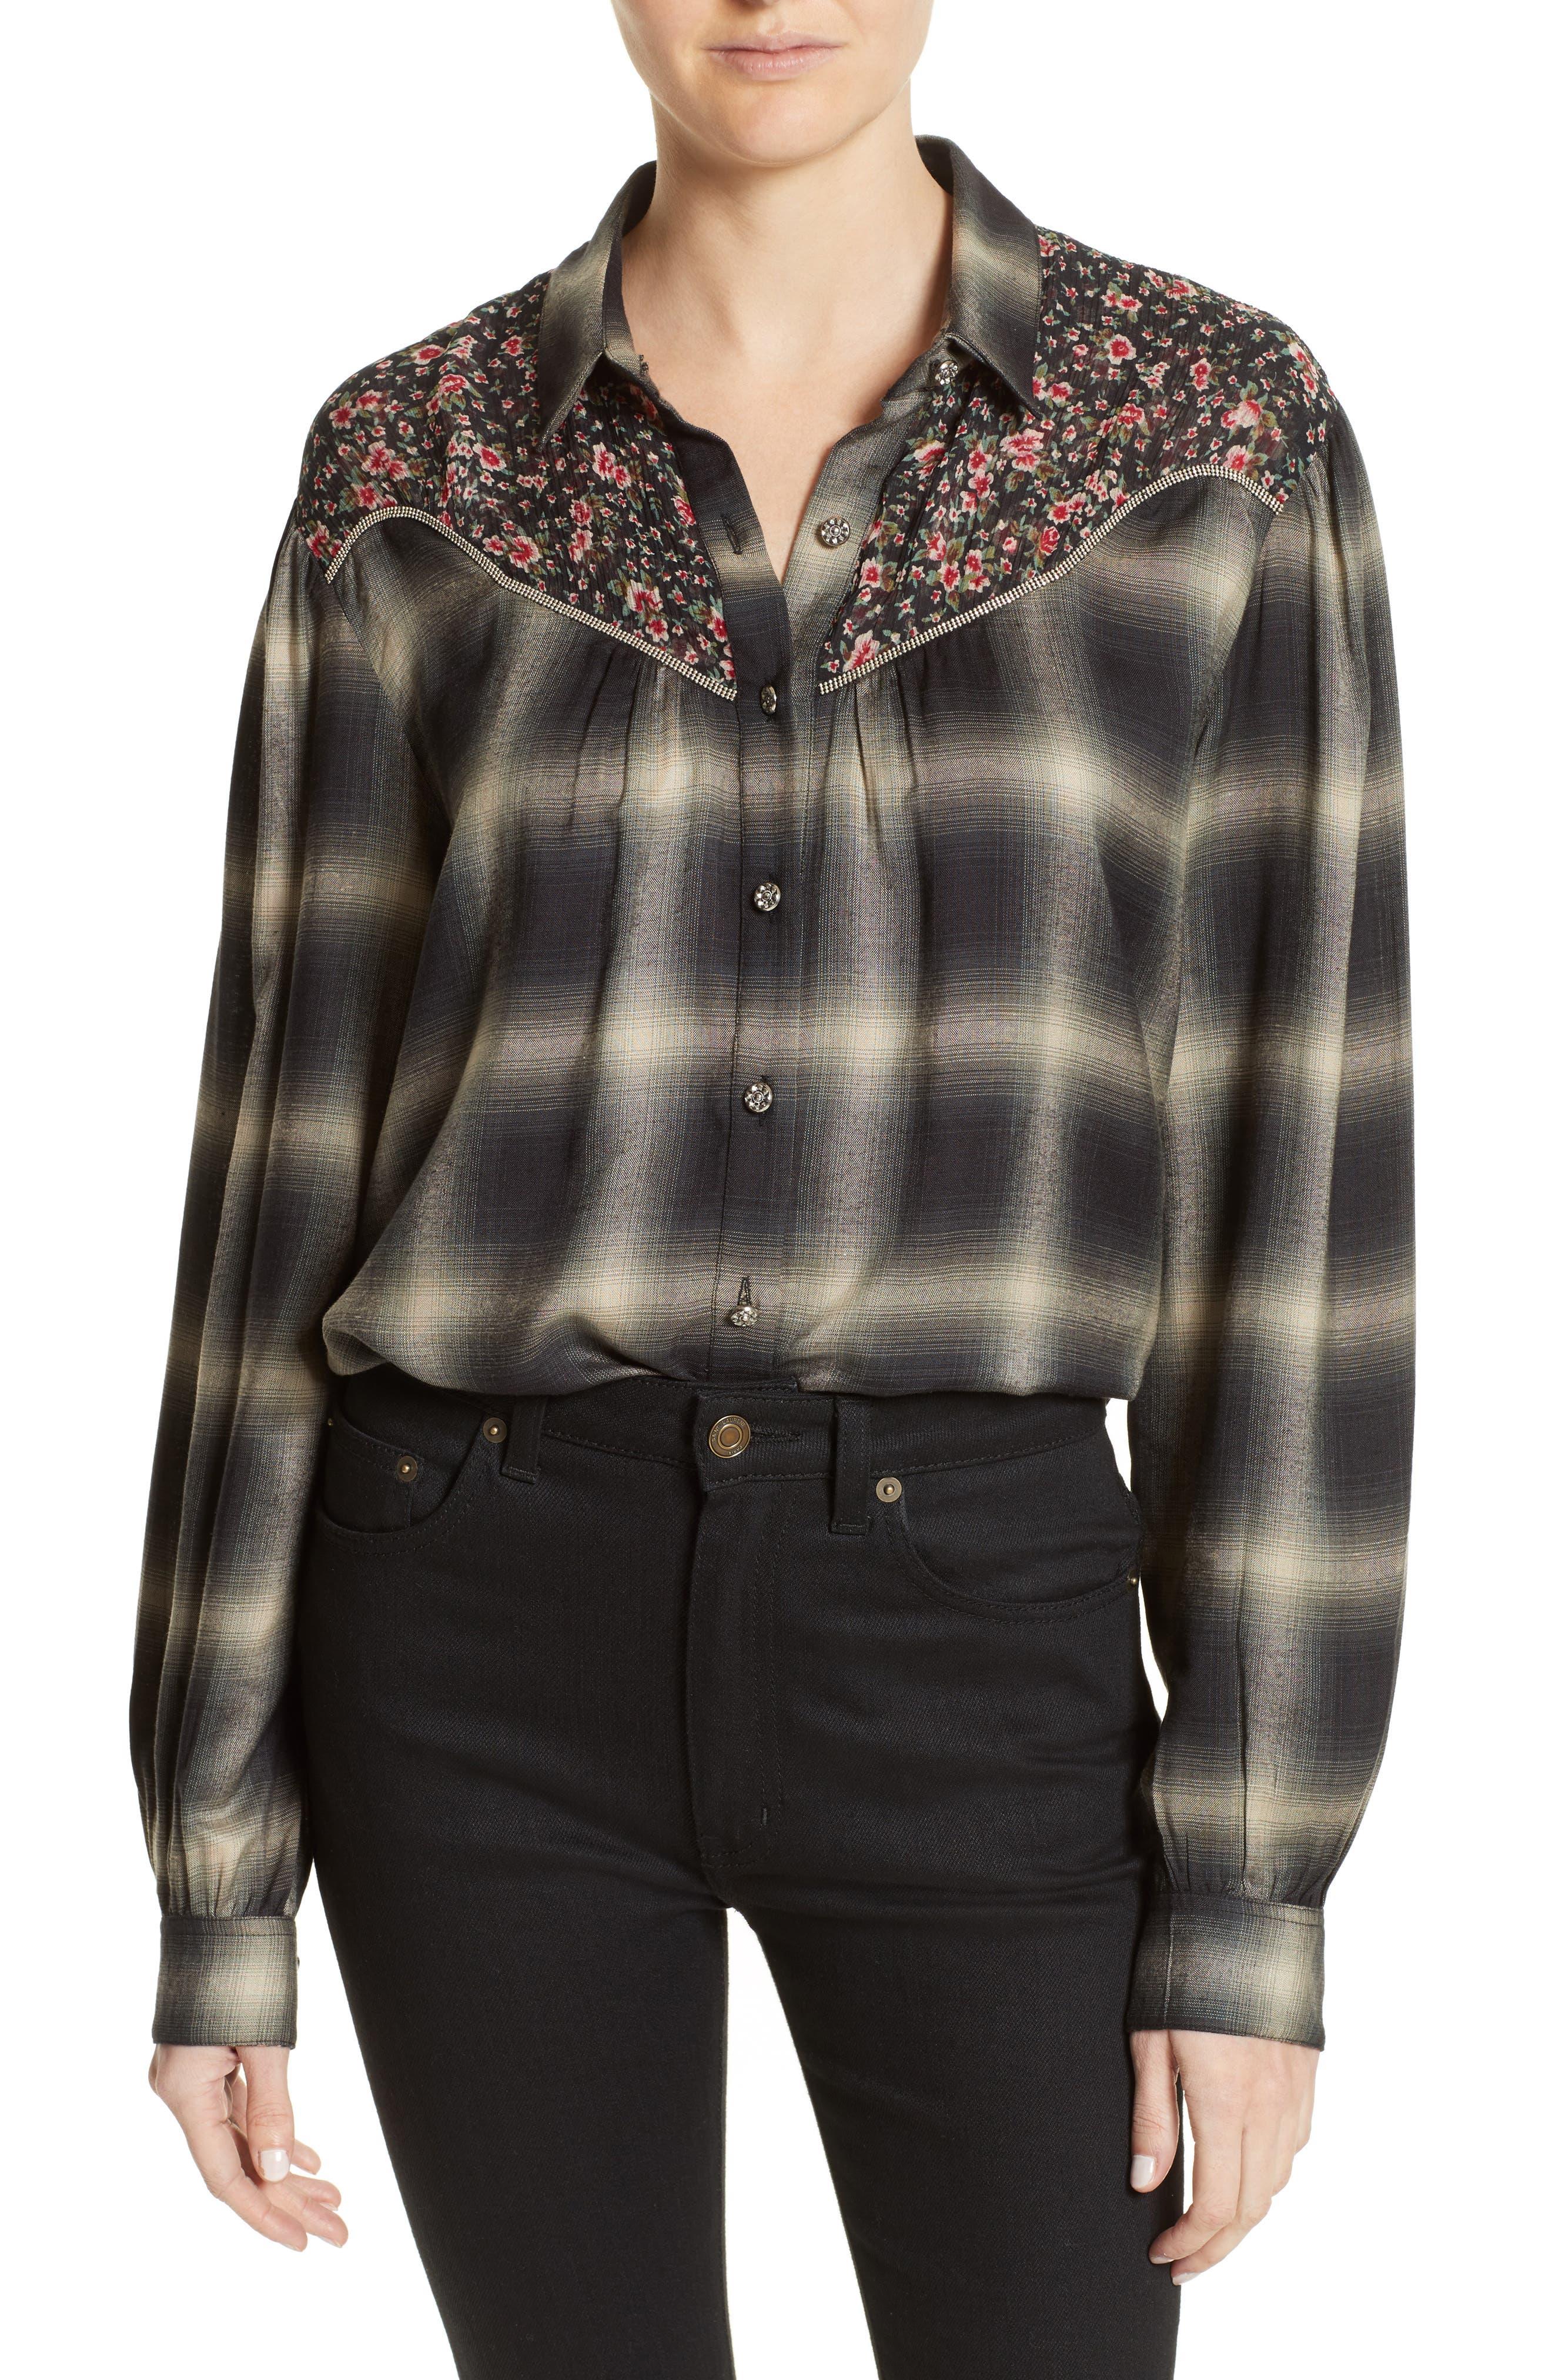 Alternate Image 1 Selected - The Kooples James Floral Print Western Shirt